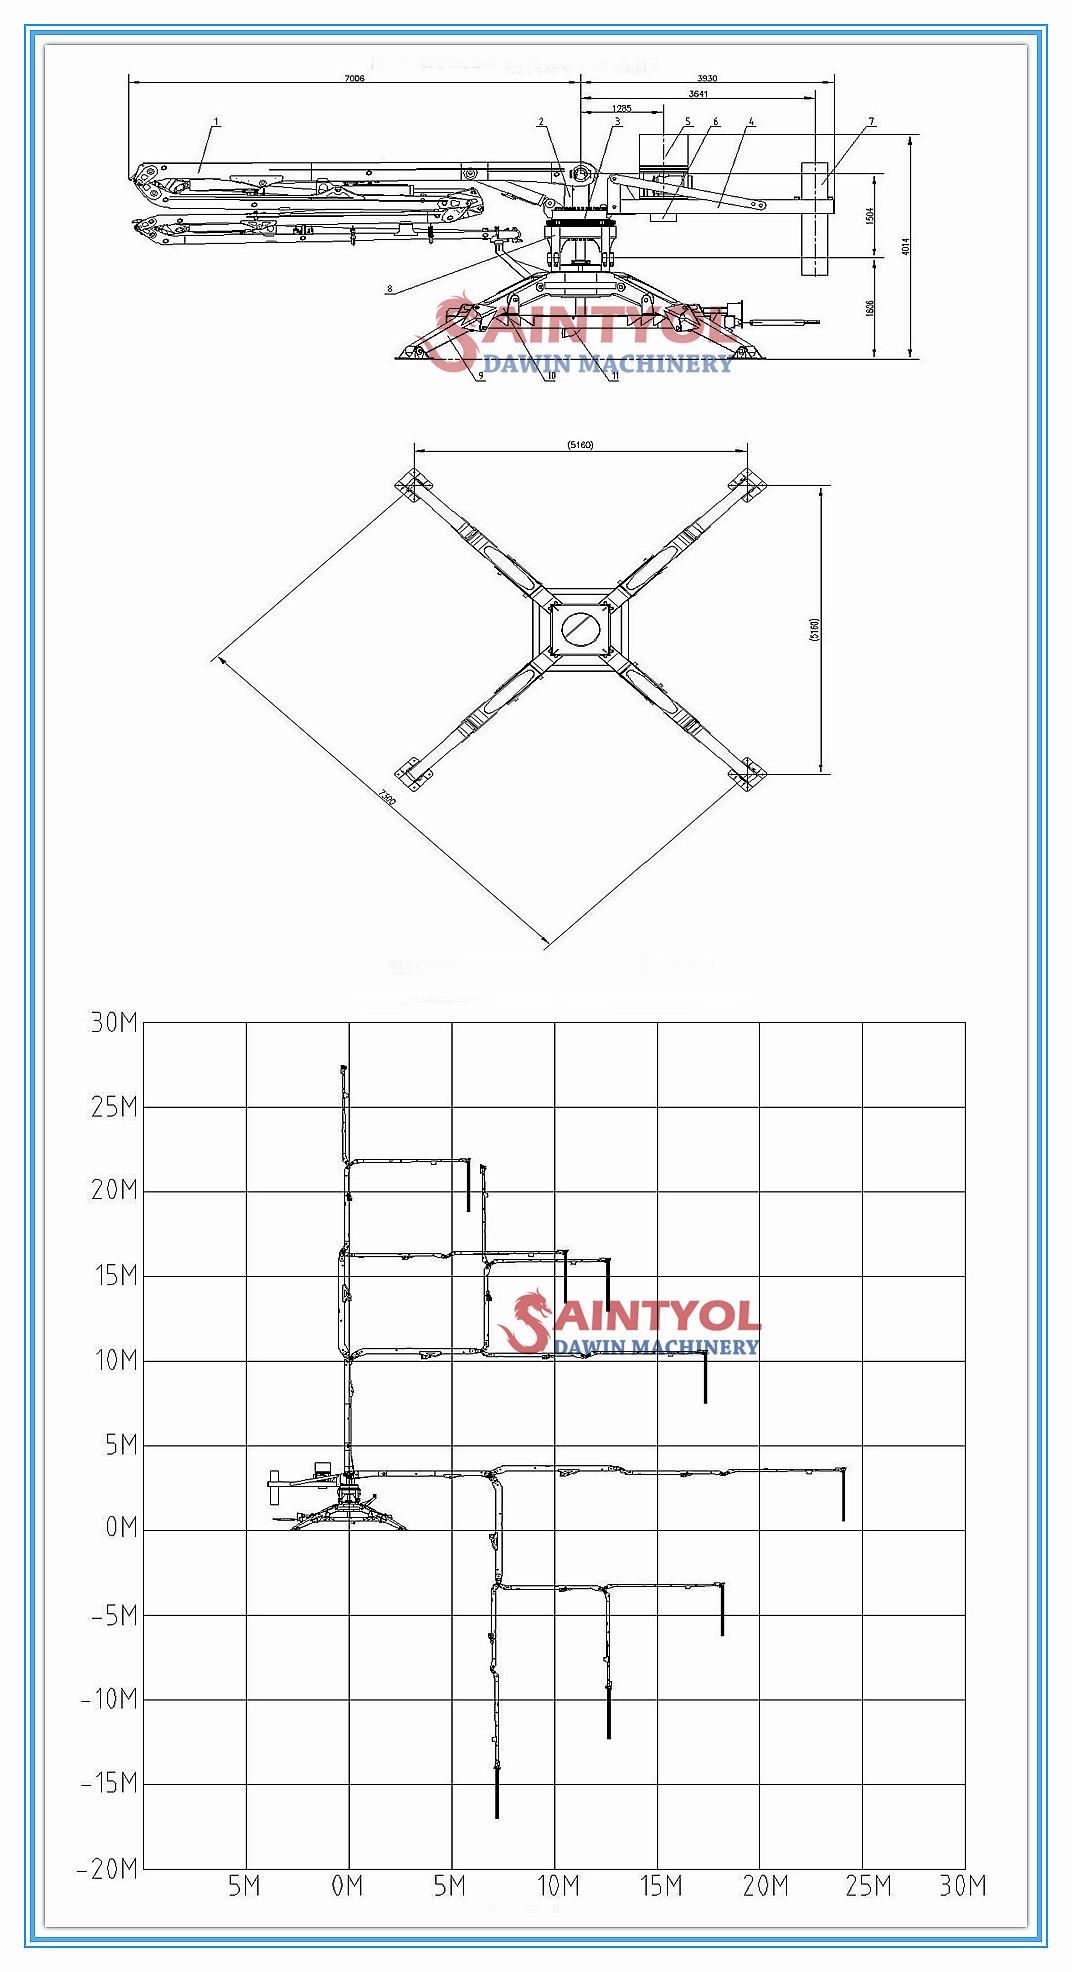 23m hydraulic spider concrete placing boom